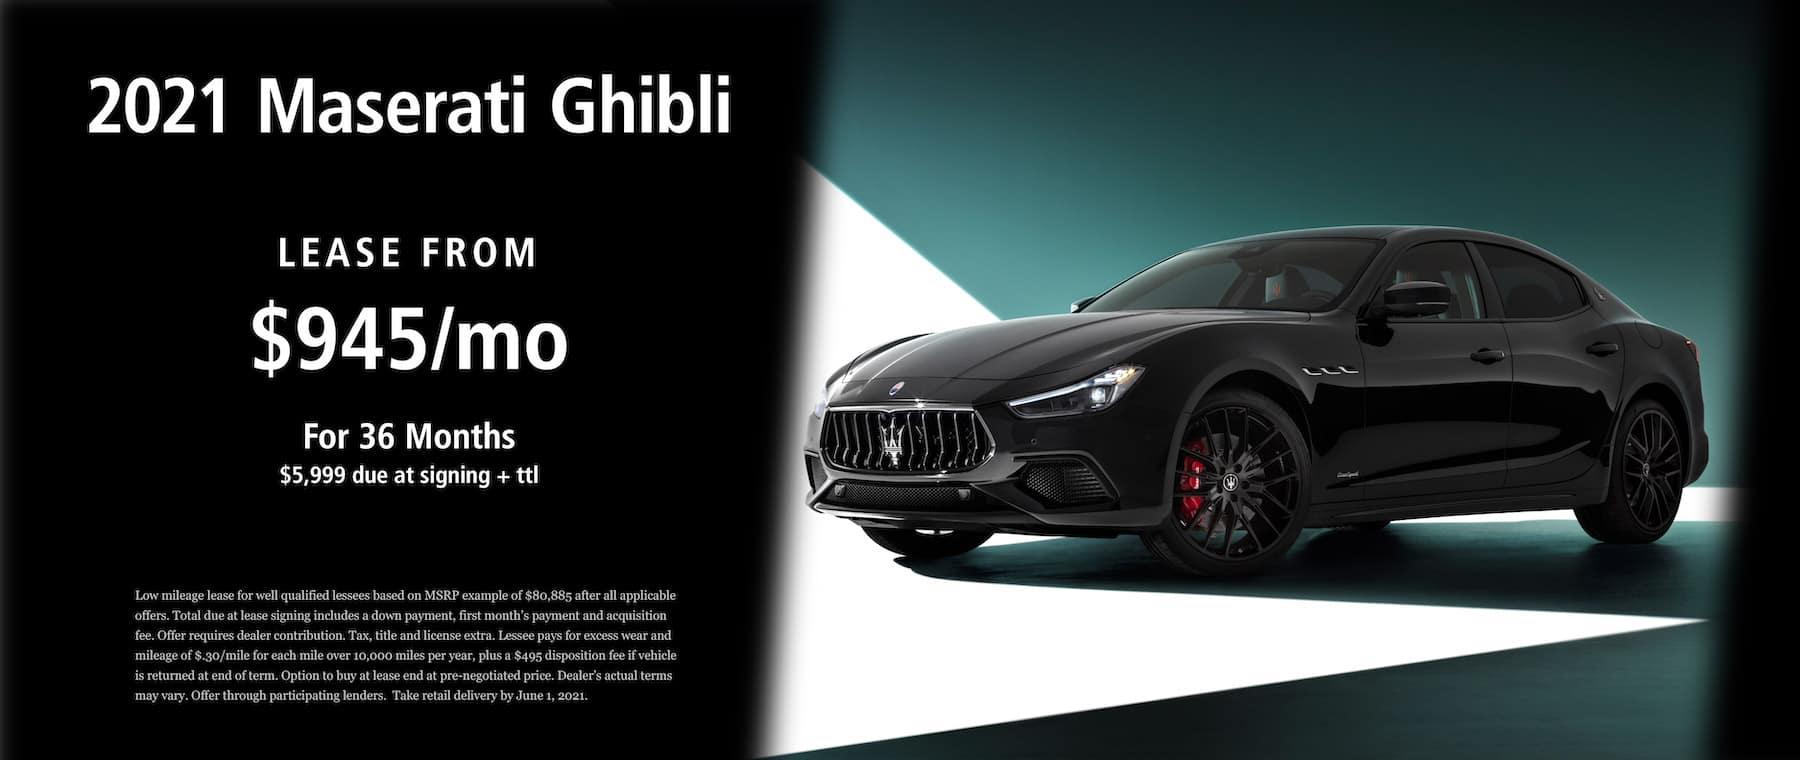 5_4_2021 Maserati Ghibli_1800x760